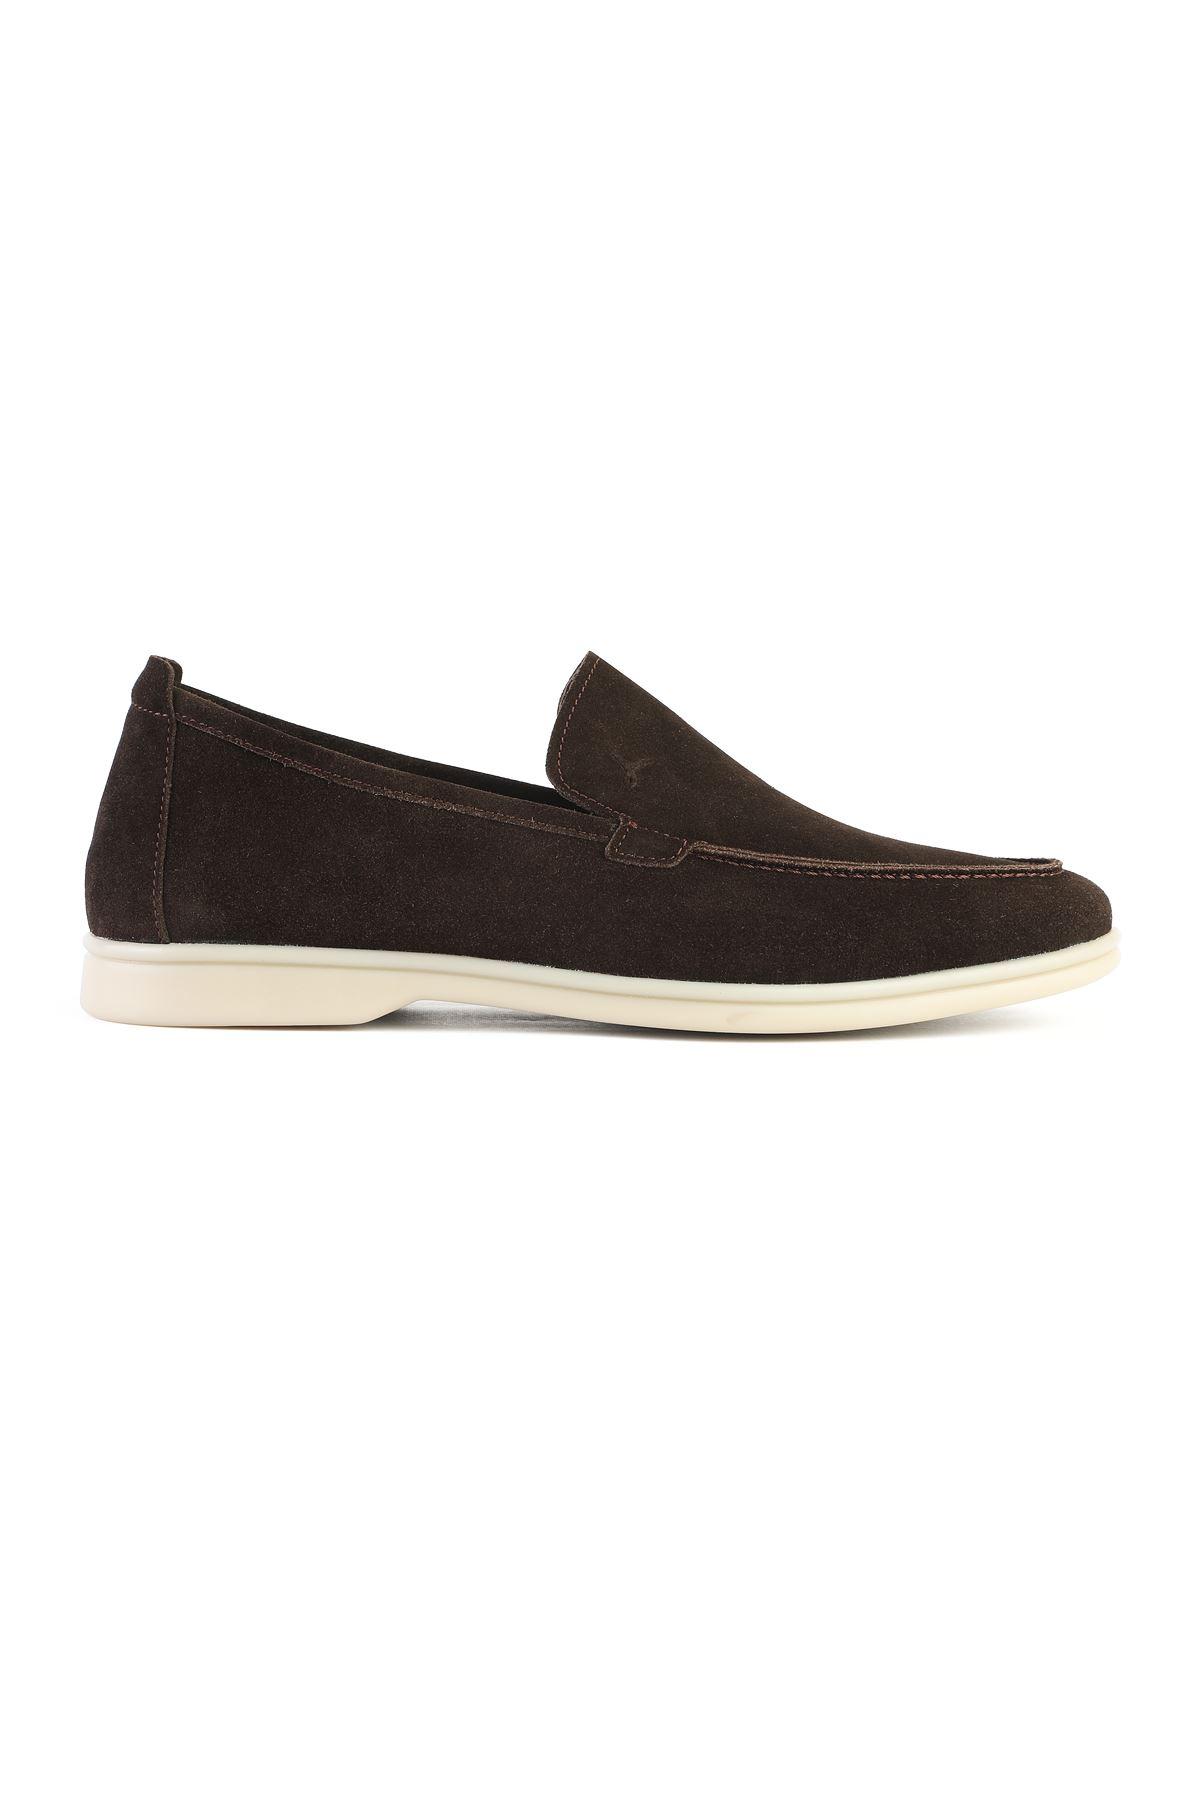 Libero 3004 Kahve Loafer Ayakkabı